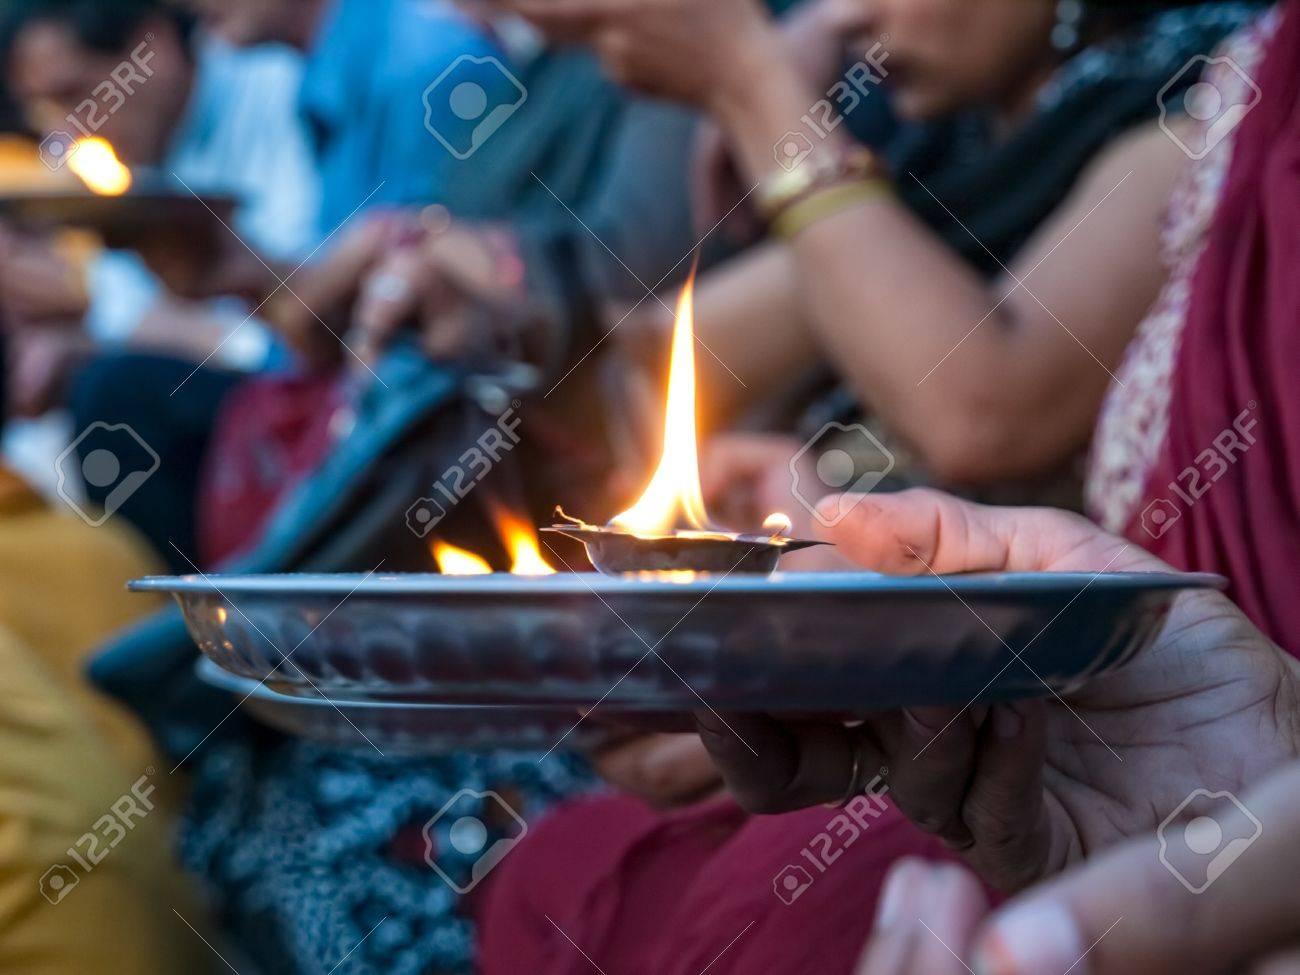 Hindu prayer ritual - detail with hand holding ceremonial fire, Rishikesh India. - 14821663